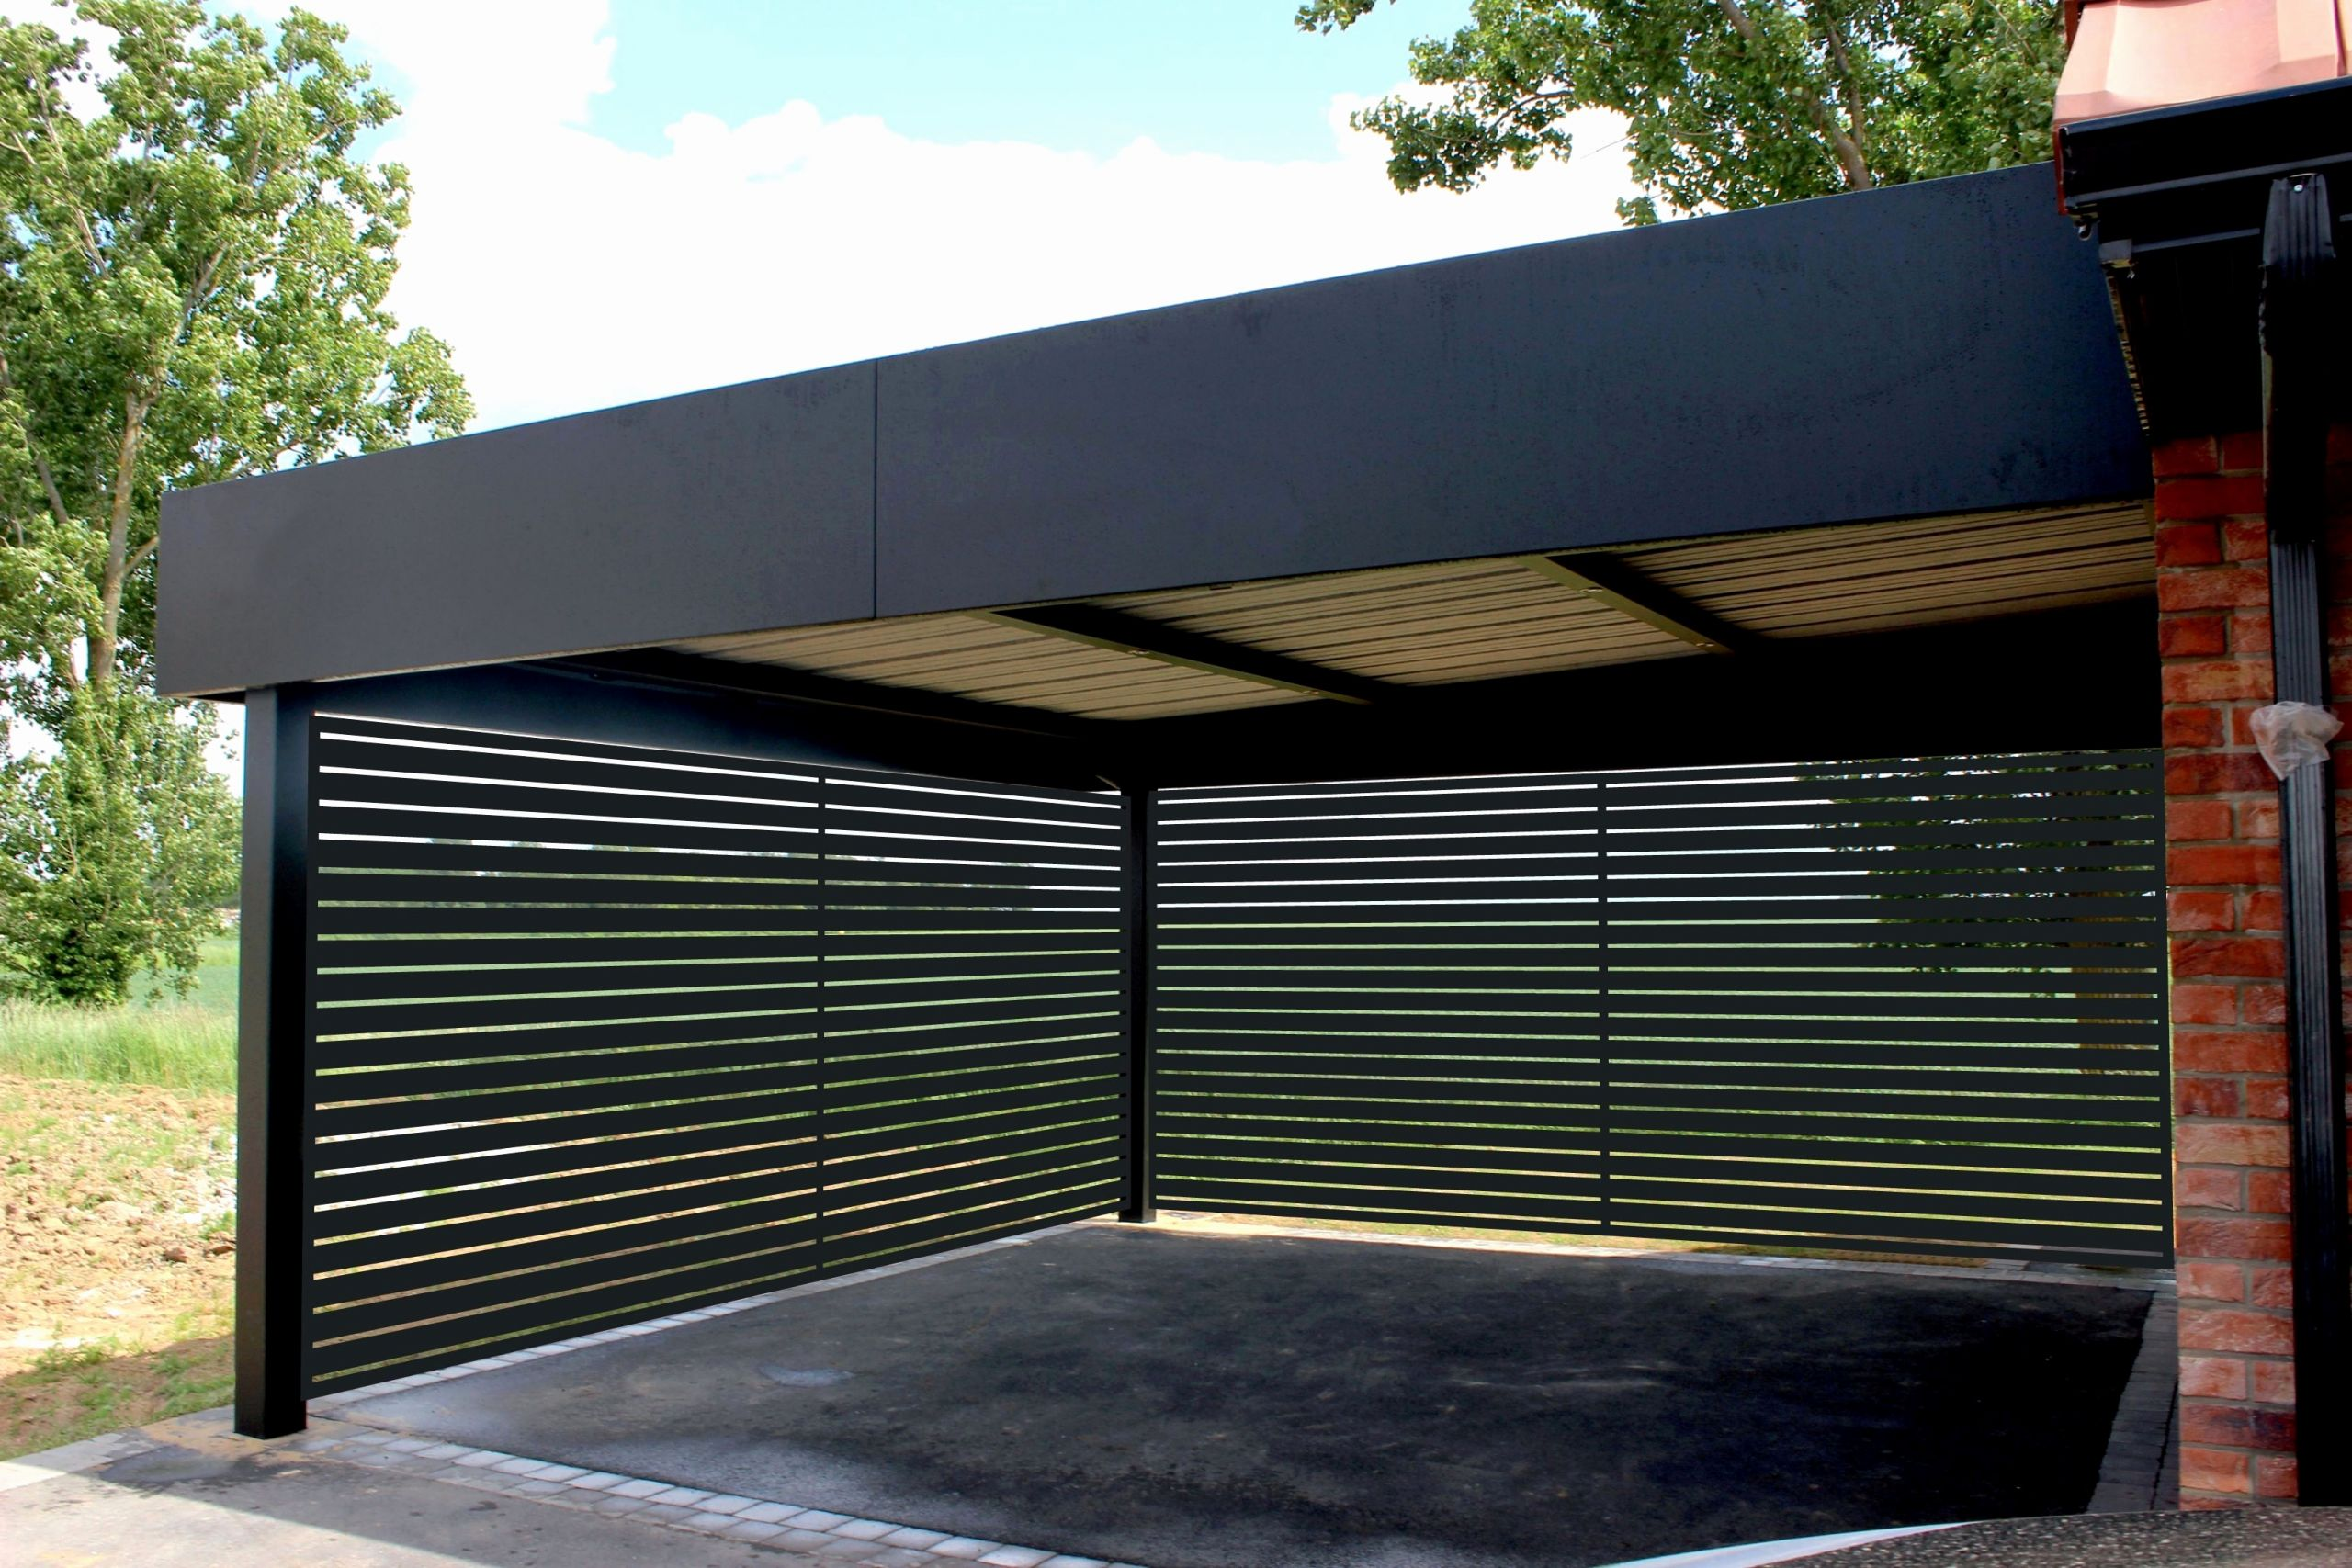 35 Inspirant Galerie De Garage toit Plat Beton